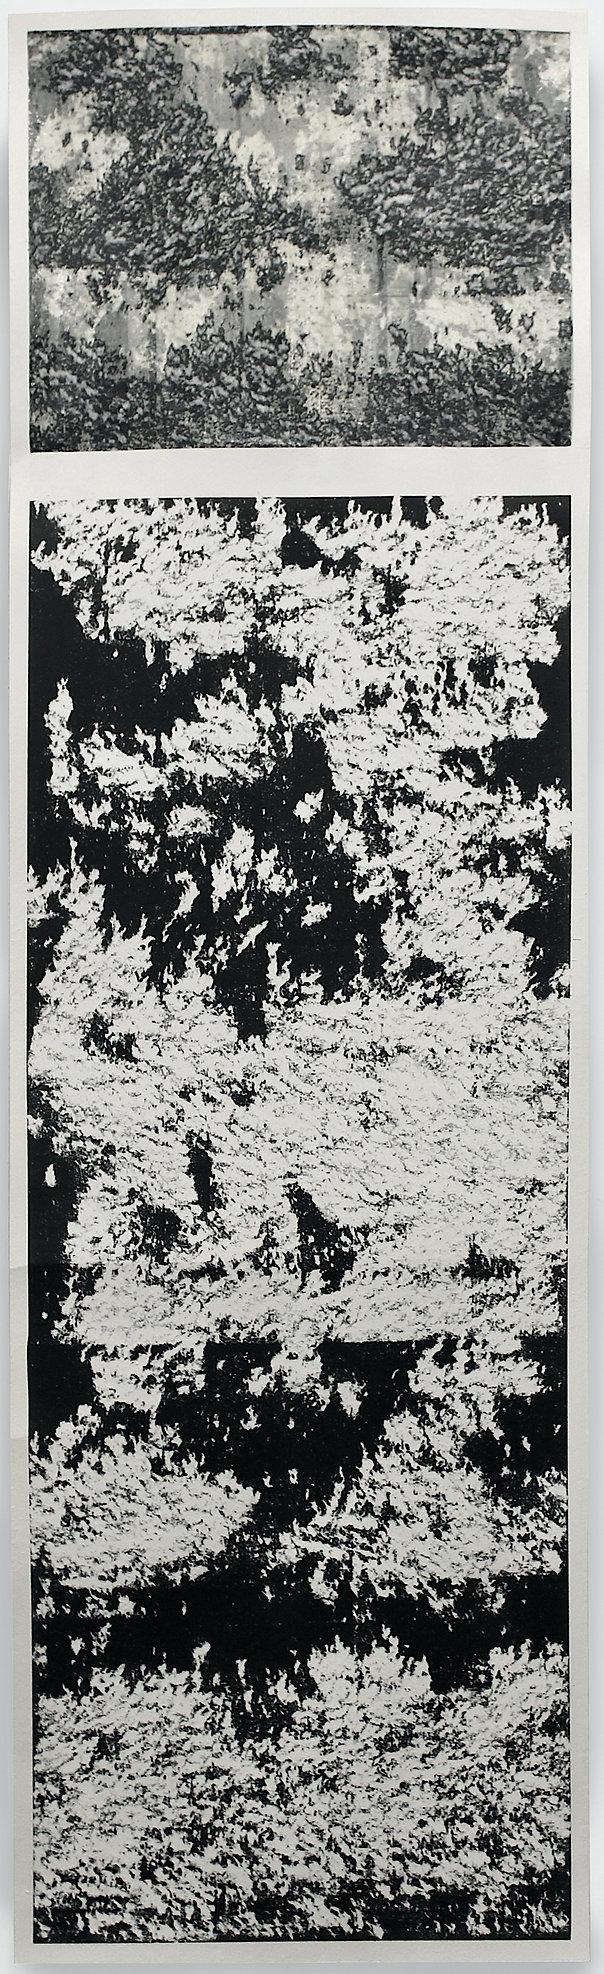 LABE GEMINUS, 2021. Tinta china y papel